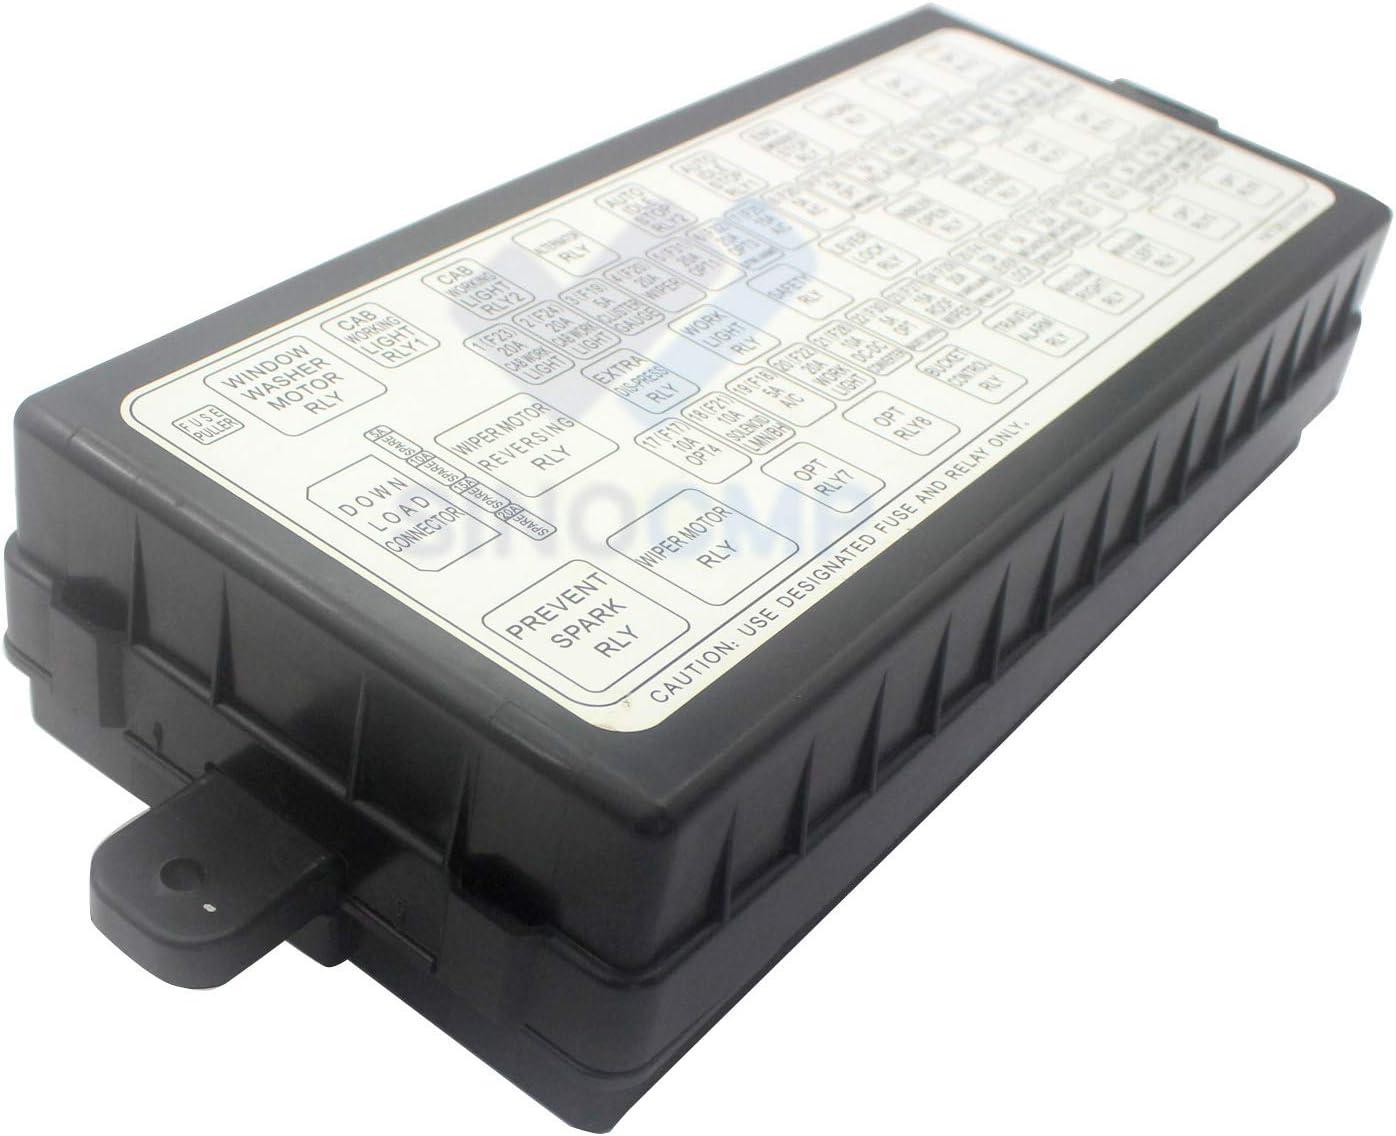 Amazon.com: YN24E00016F2 YY24E00008F2 Fuse Relay Box - SINOCMP Relay  Assembly Controller Monitor Fuse Relay Box for Kobelco SK200-8 SK230-8  SK210-8 SK250-8 SK350-8 Excavator Parts, 3 Month Warranty: AutomotiveAmazon.com